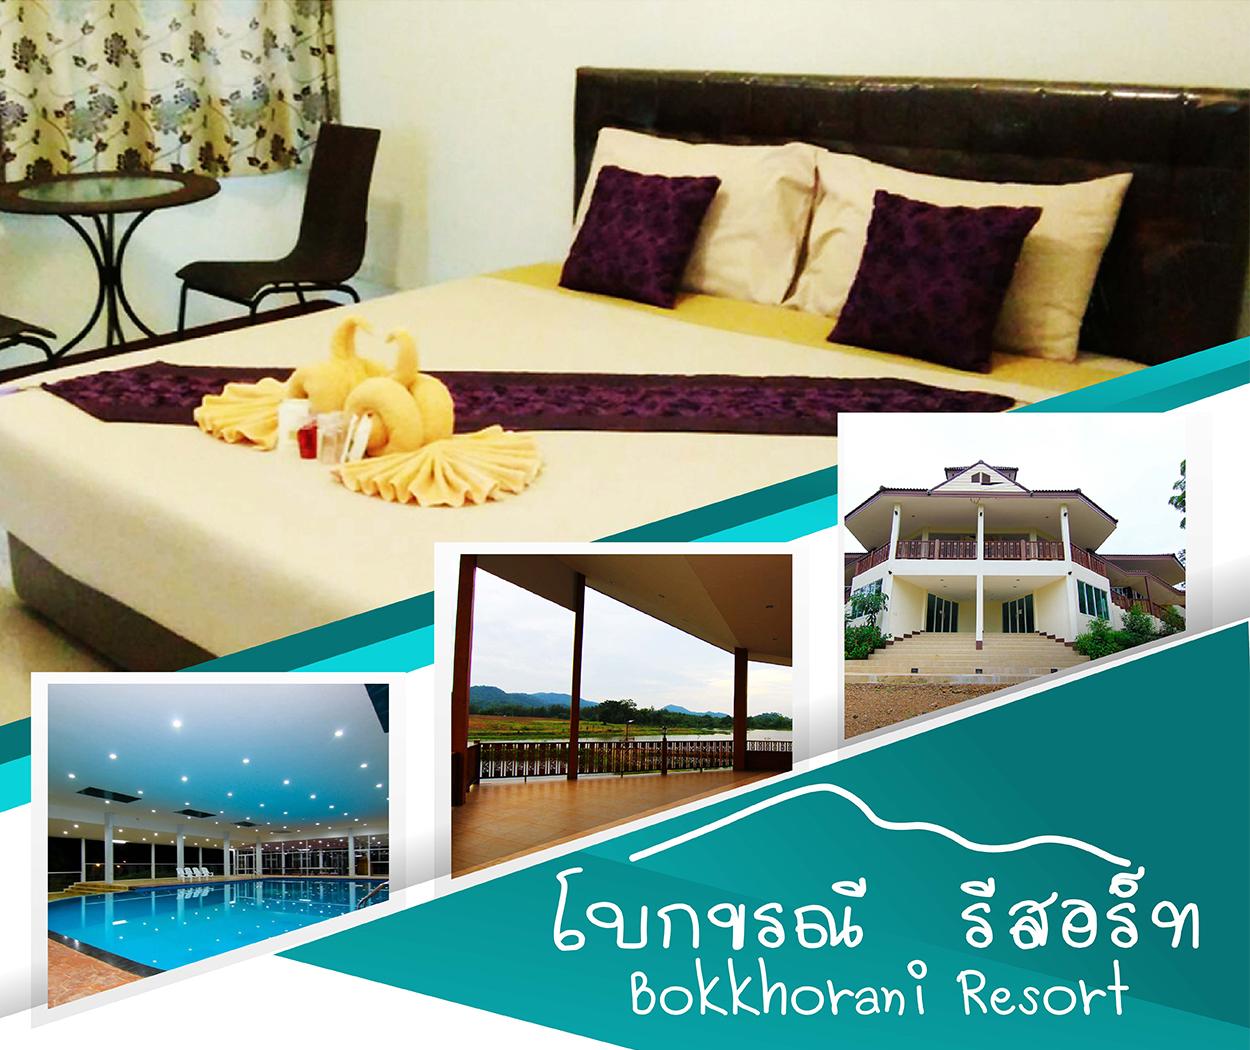 Bokkhorani Resort